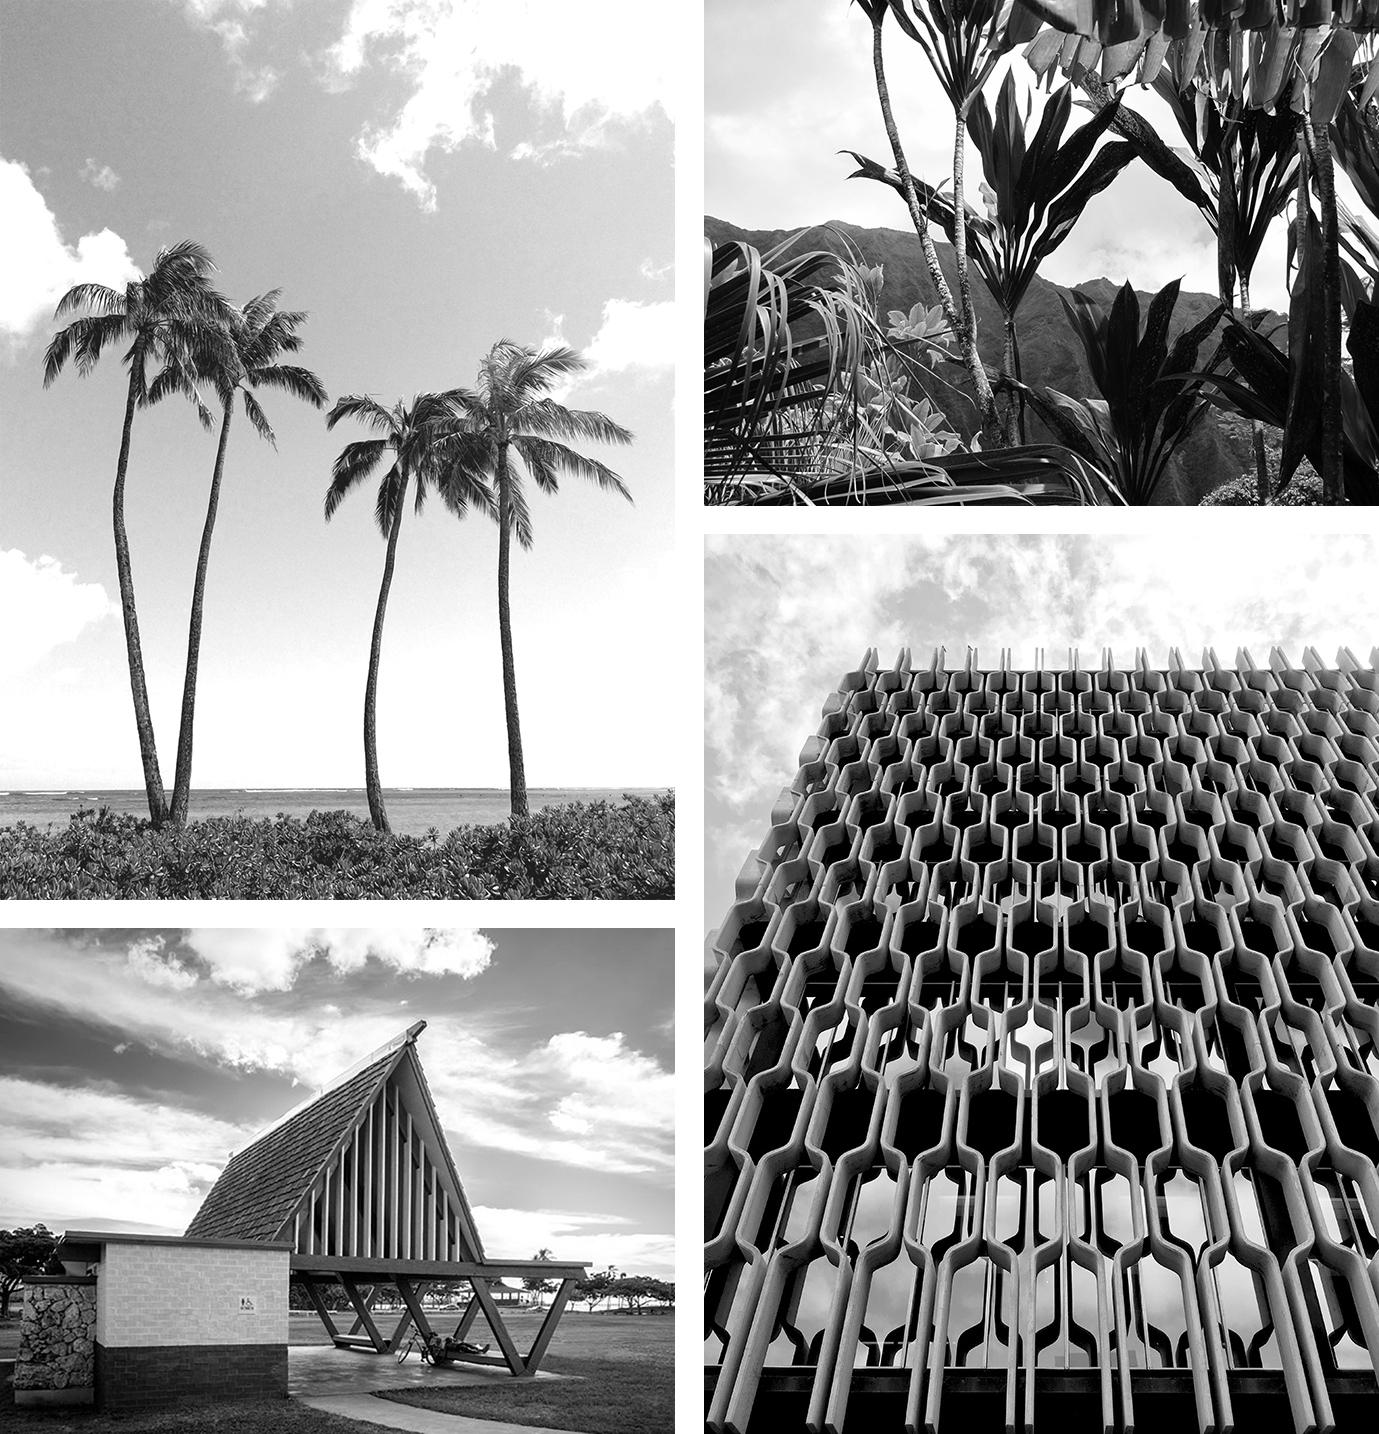 photos clockwise from top left: Waikiki palm trees, Ko'olau Mountains, IBM building, public restroom.